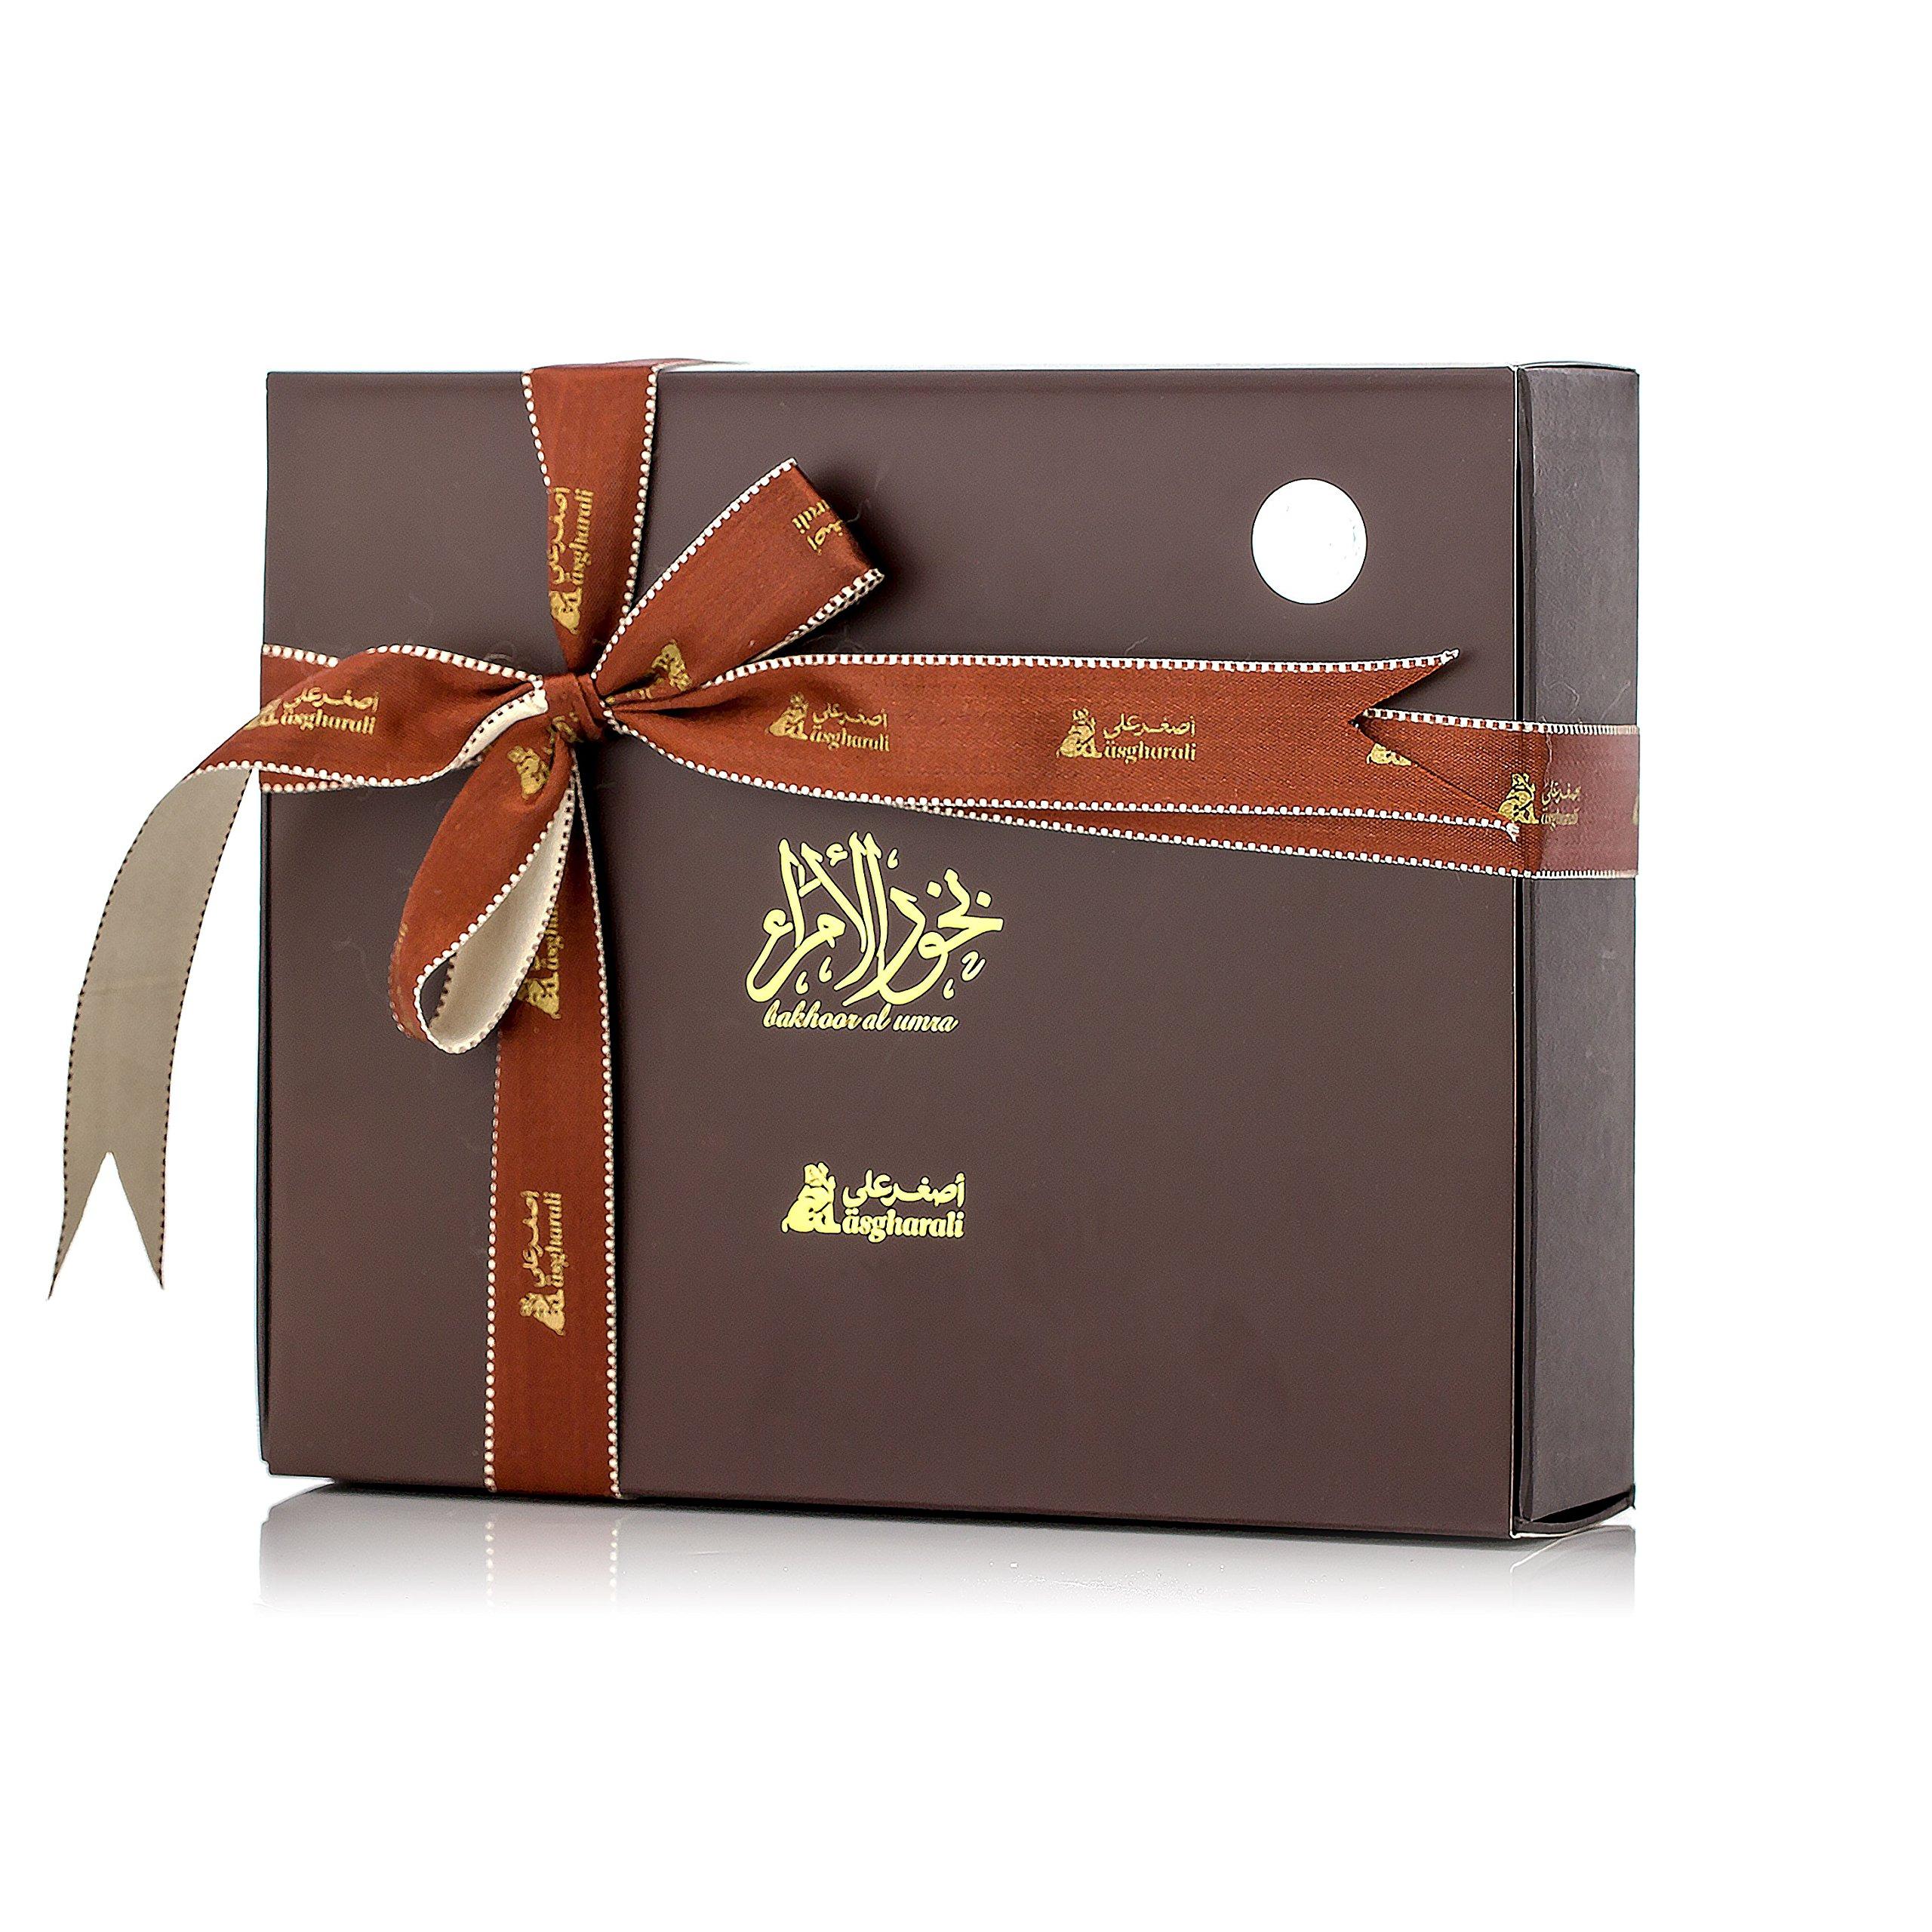 BAKHOOR AL UMRA 240gm Asgharali Arabic Incense, Agarwood Oudh, Woody Vanilla Spicy, Room Fragrance by Asgharali BAKHOOR AL UMRA (Image #2)